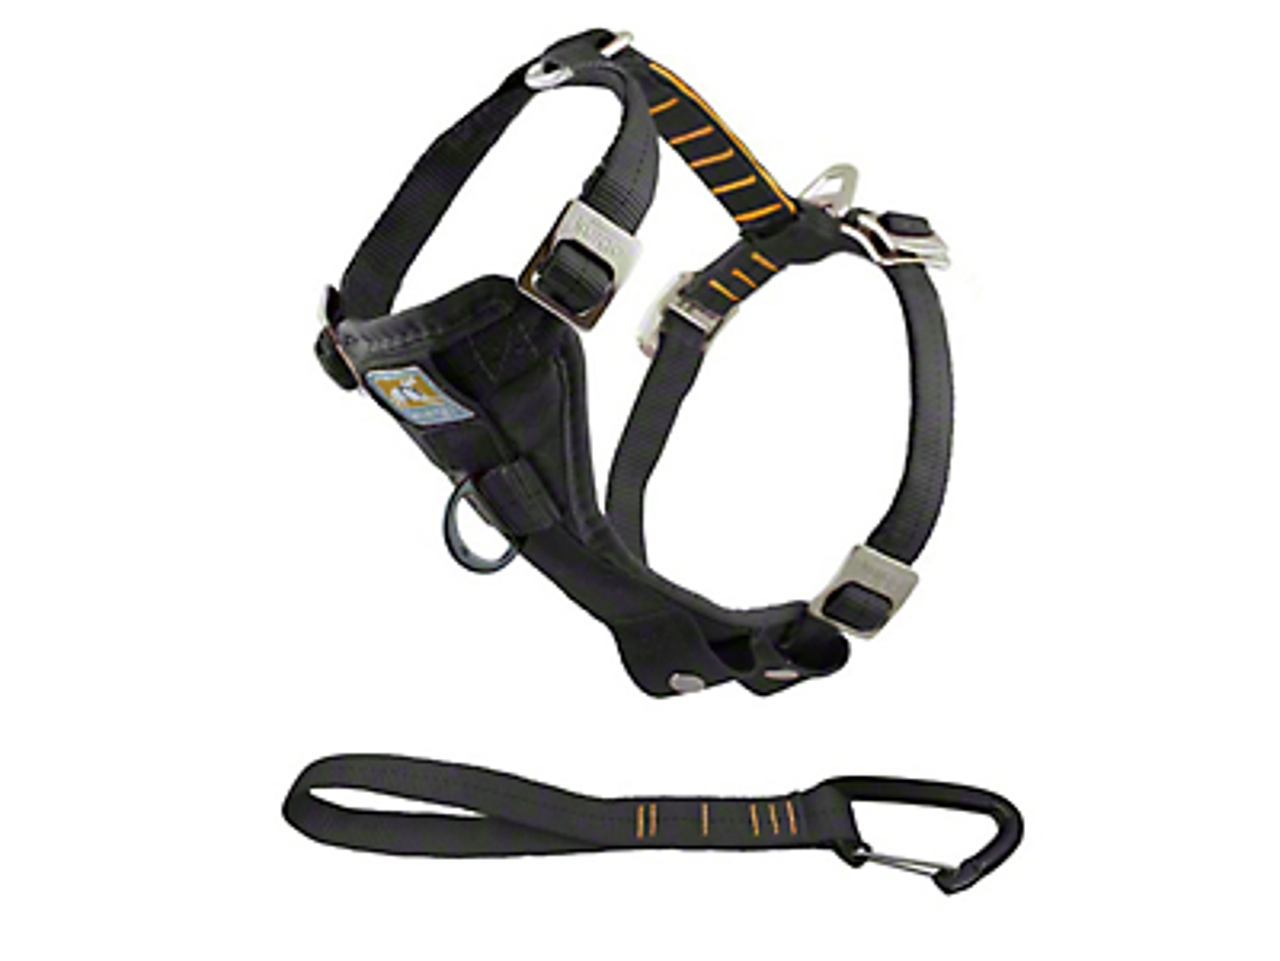 Kurgo Enhanced Strength TruFit Dog Car Harness - Black (97-18 F-150)